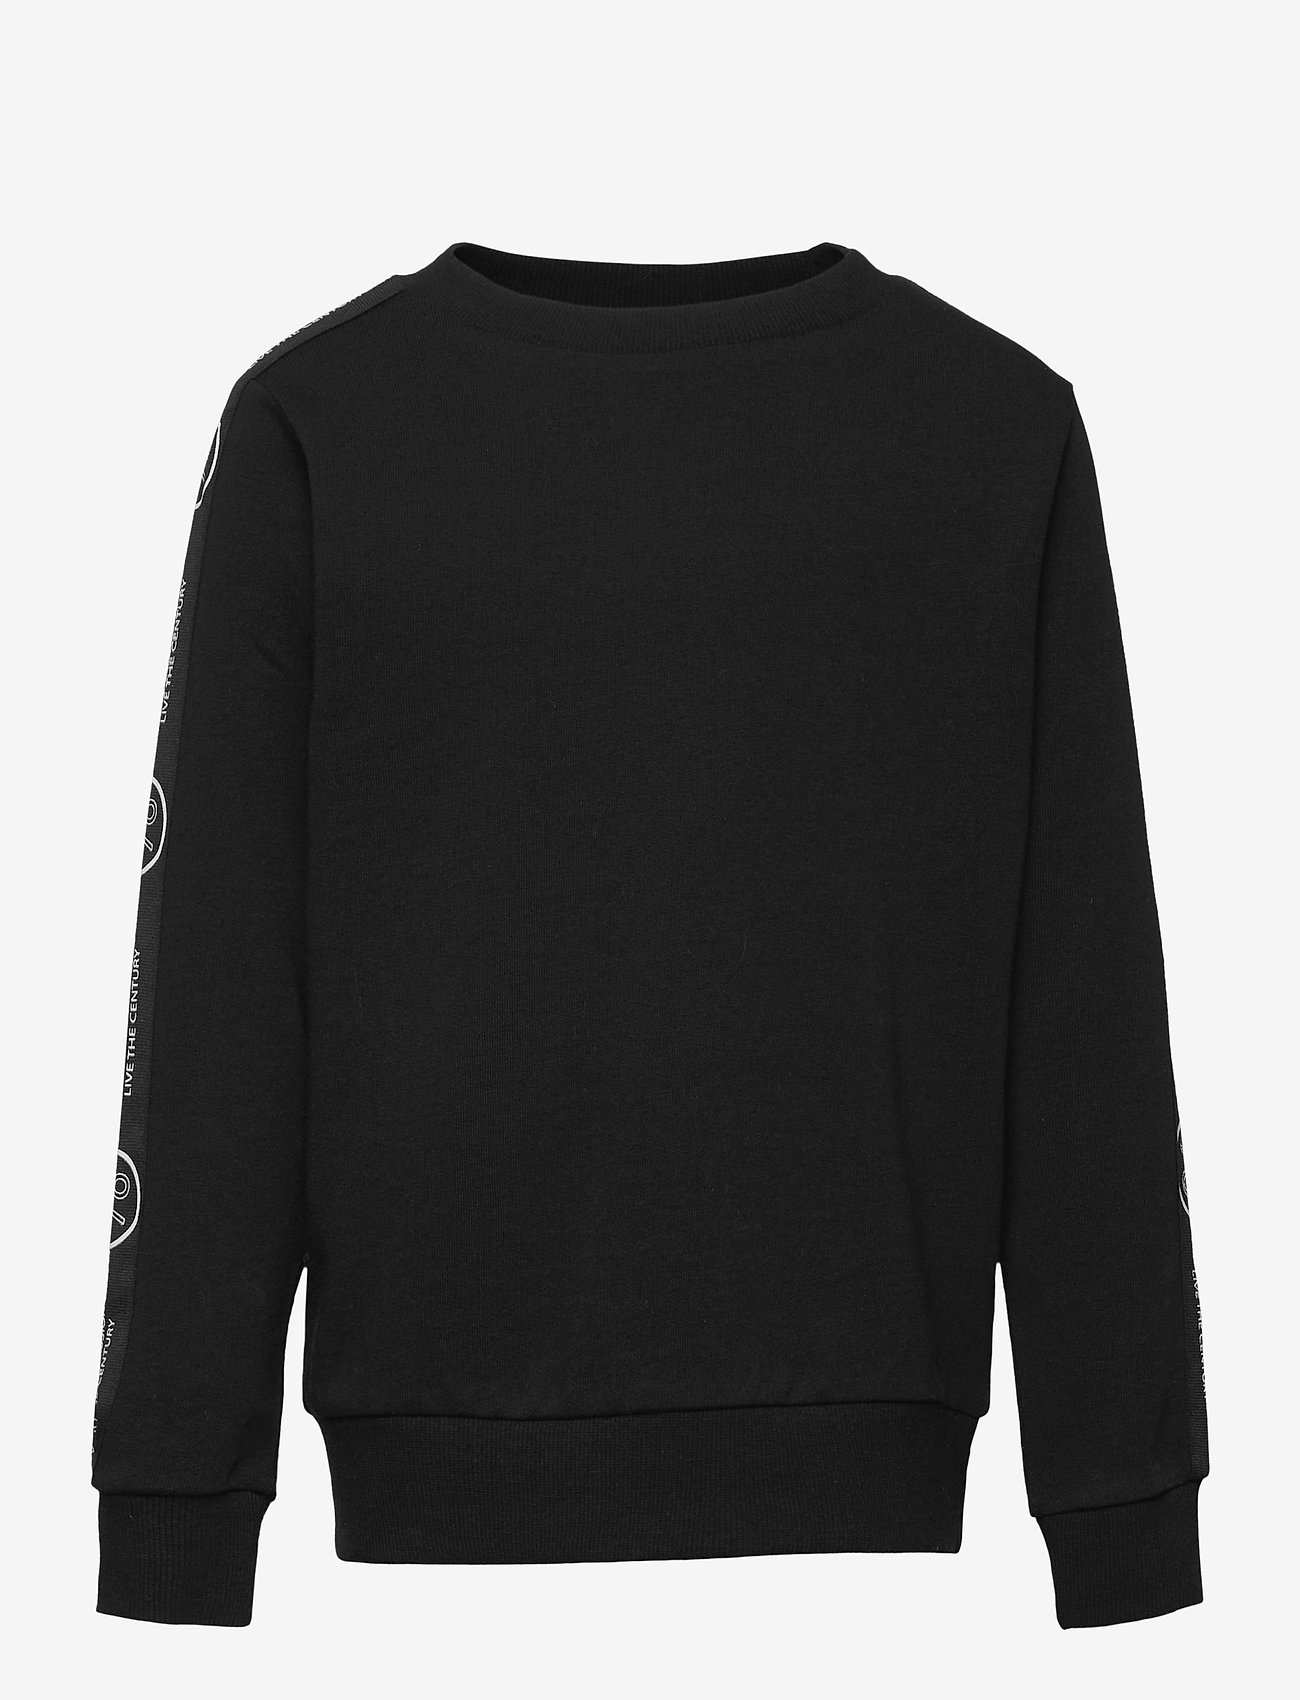 LMTD - NLMBRUNO LS SWEAT - sweatshirts - black - 0